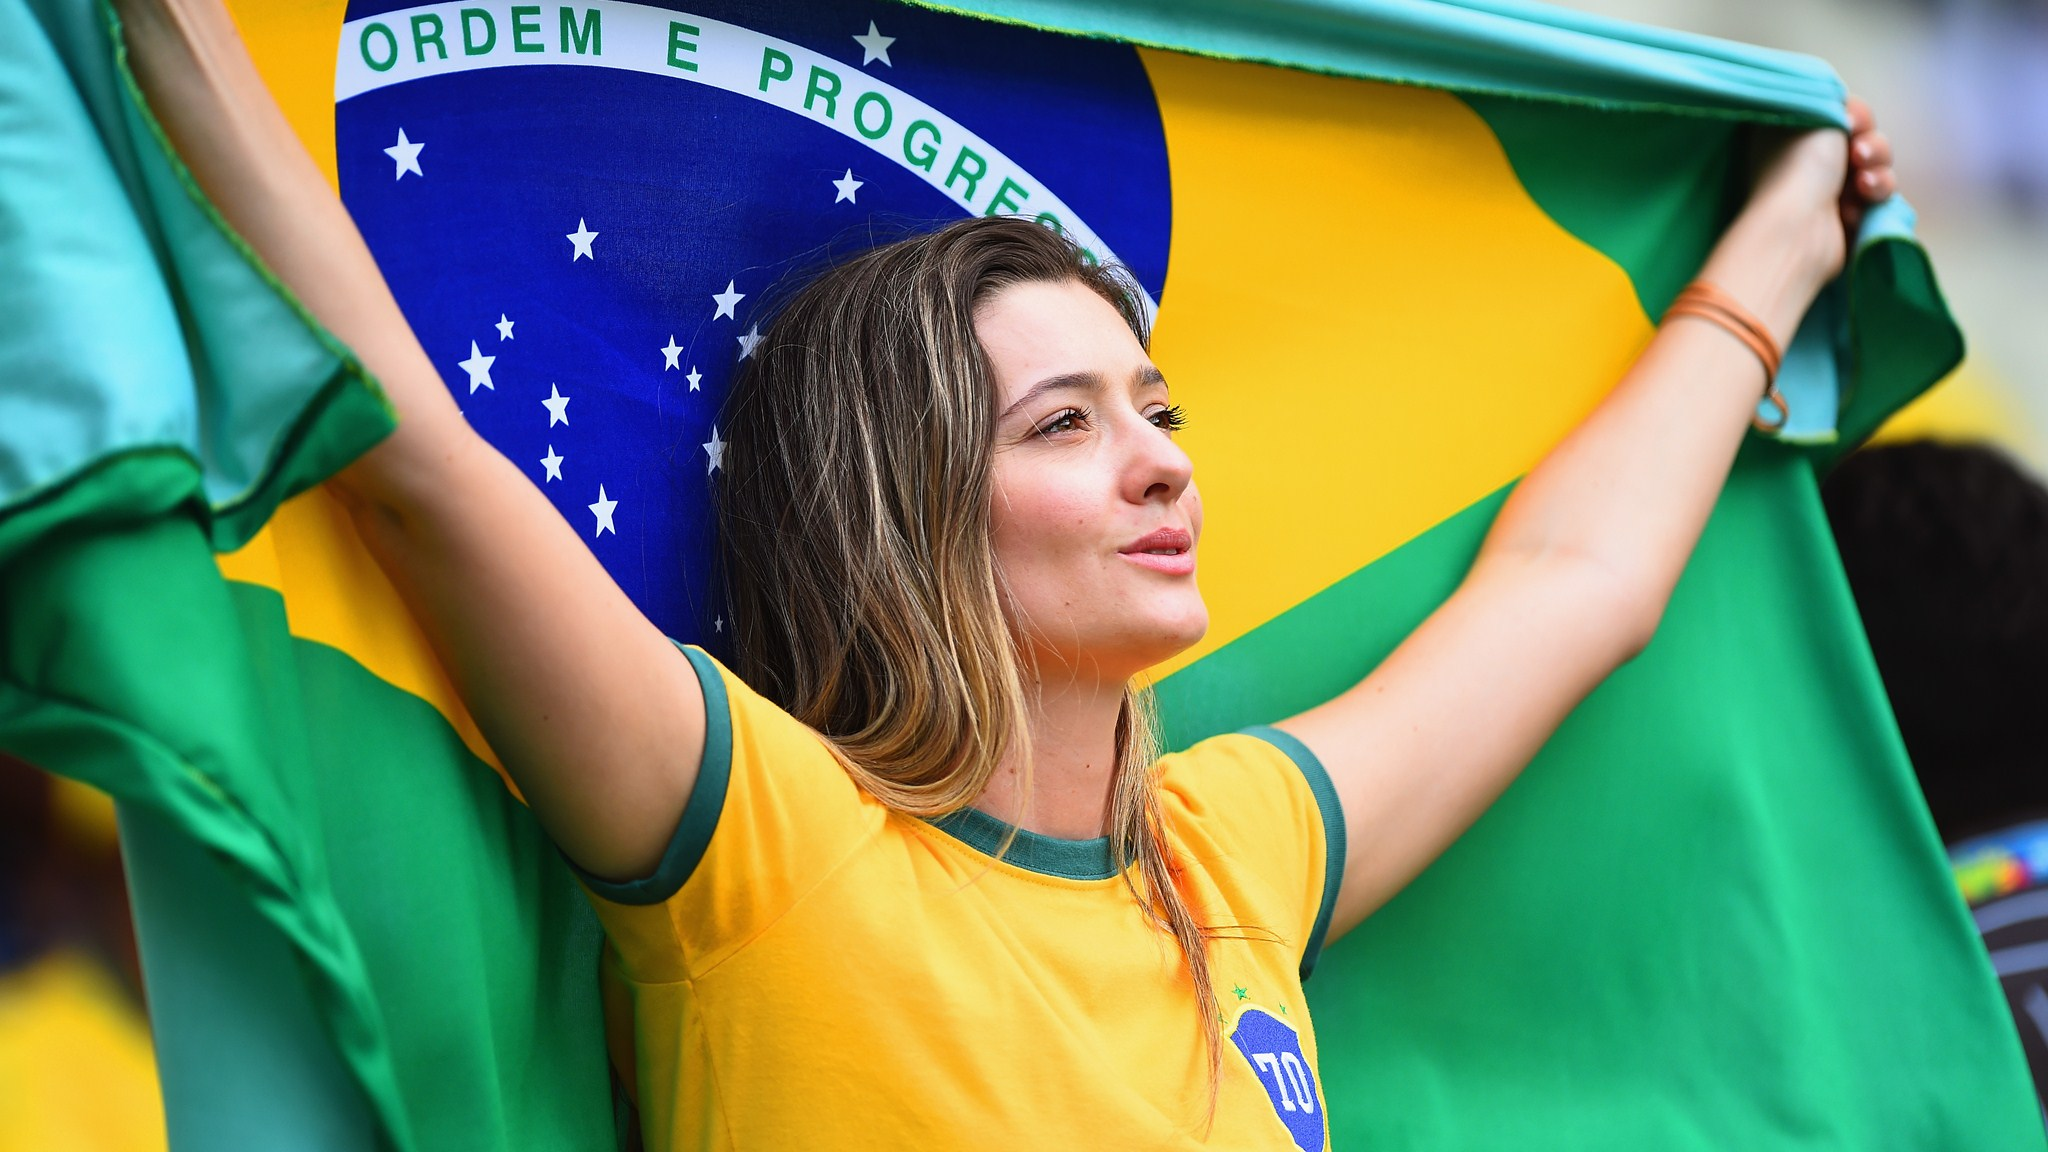 150 - Brazil-Mexico [0-0] -- 17 Jun 2014 - 16-00 -- Fortaleza - Estadio Castelao - kuaza